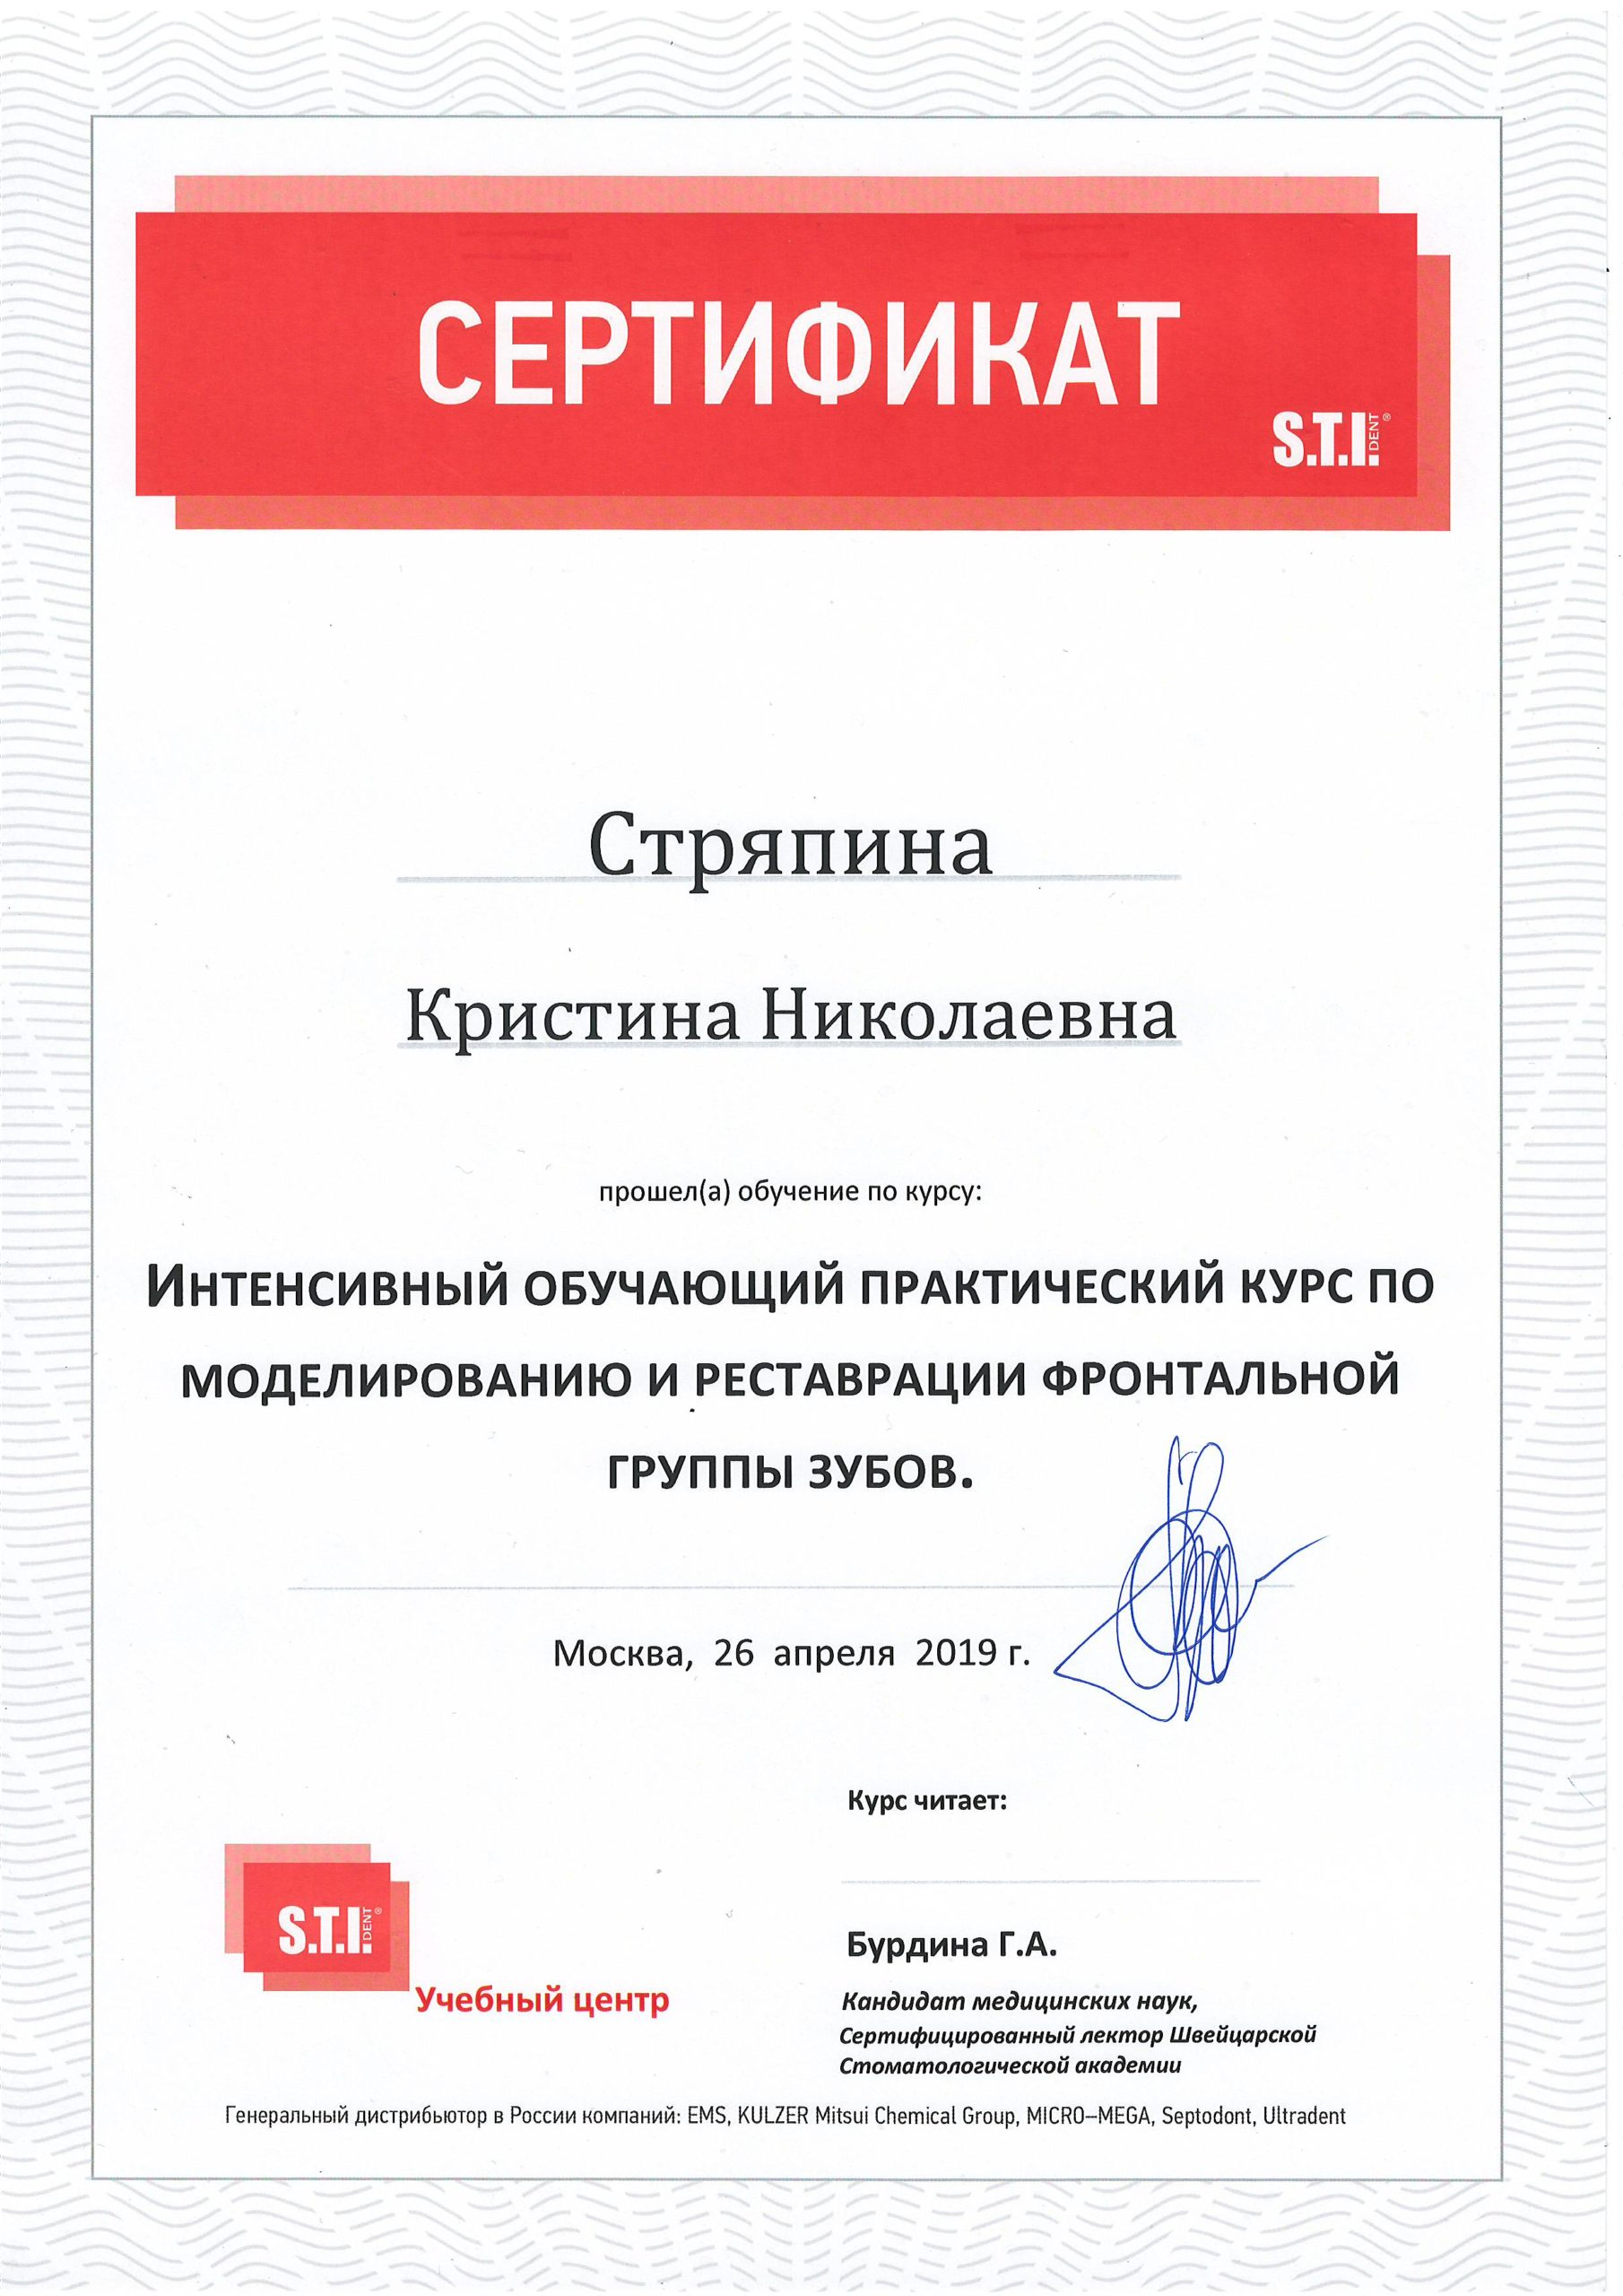 Сертификат Стряпиной Кристины